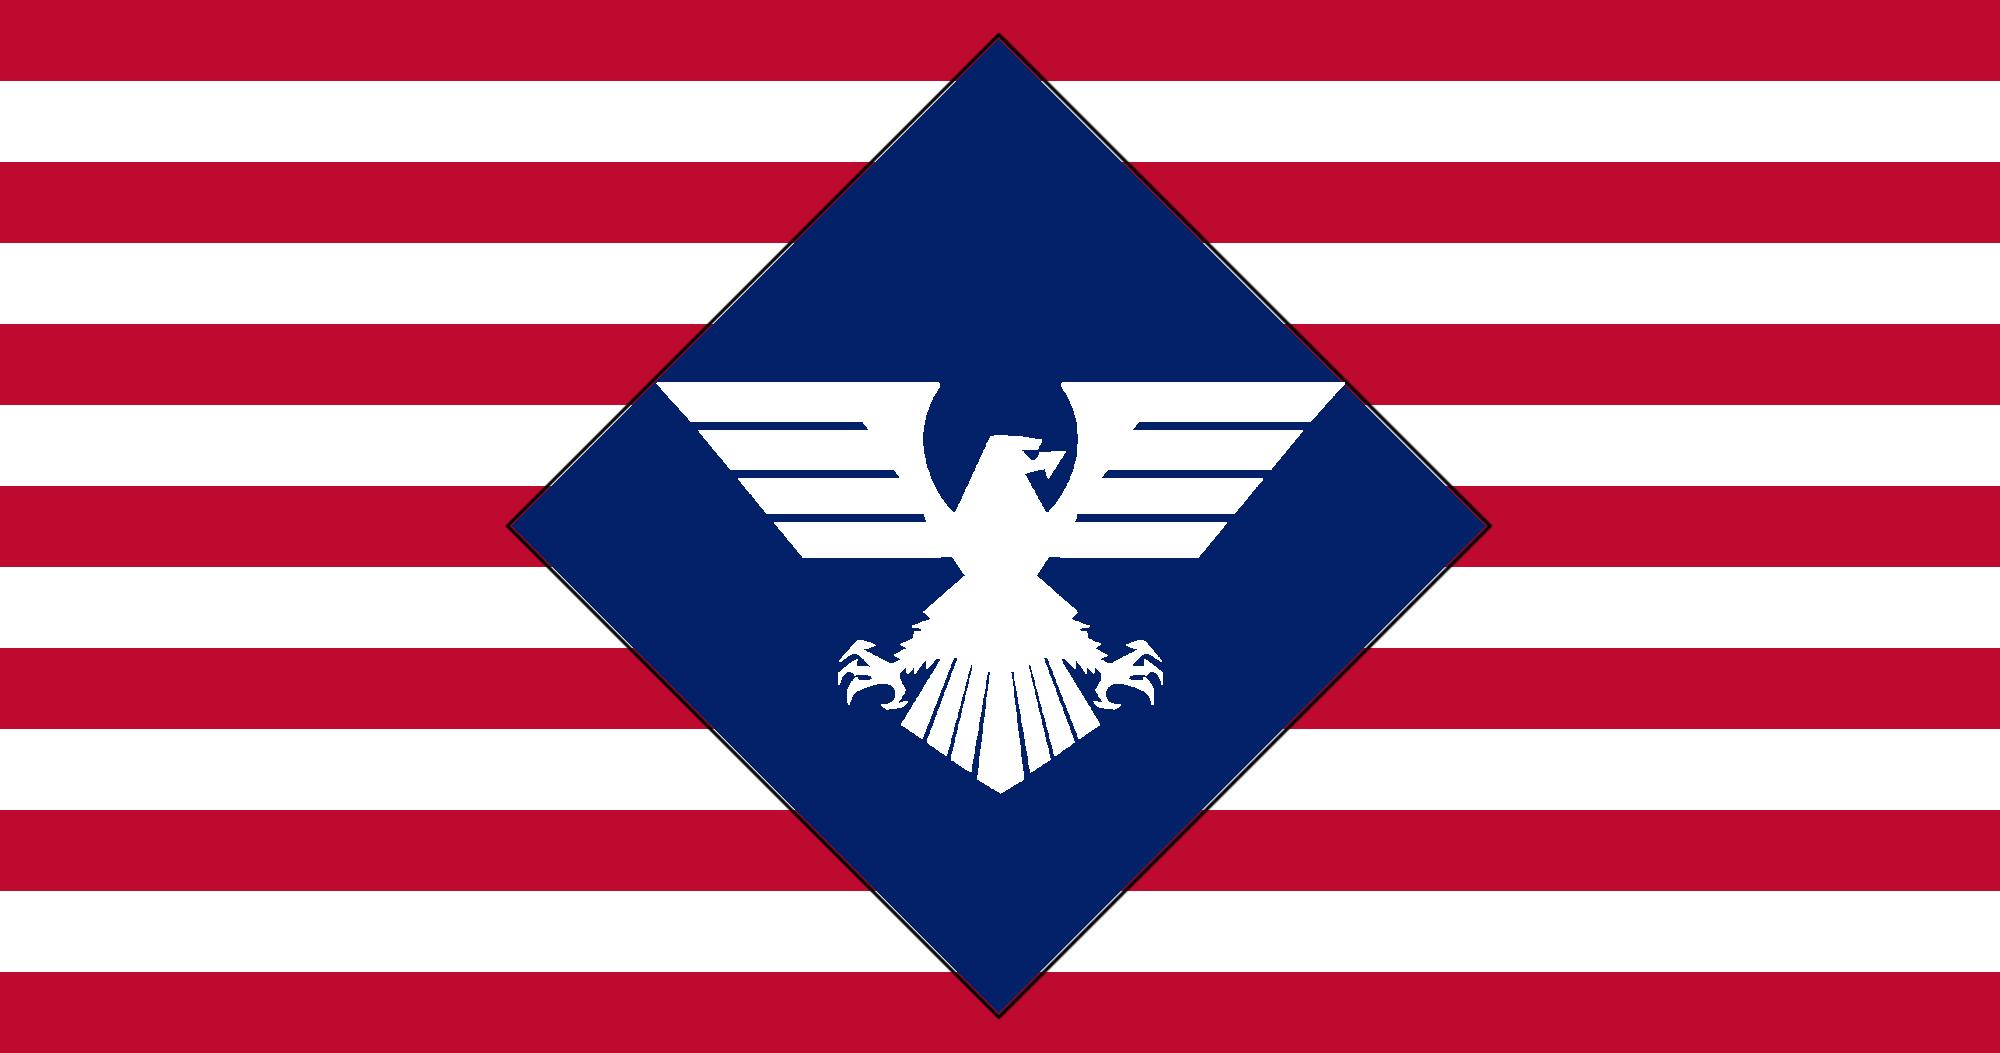 New American Flag Design